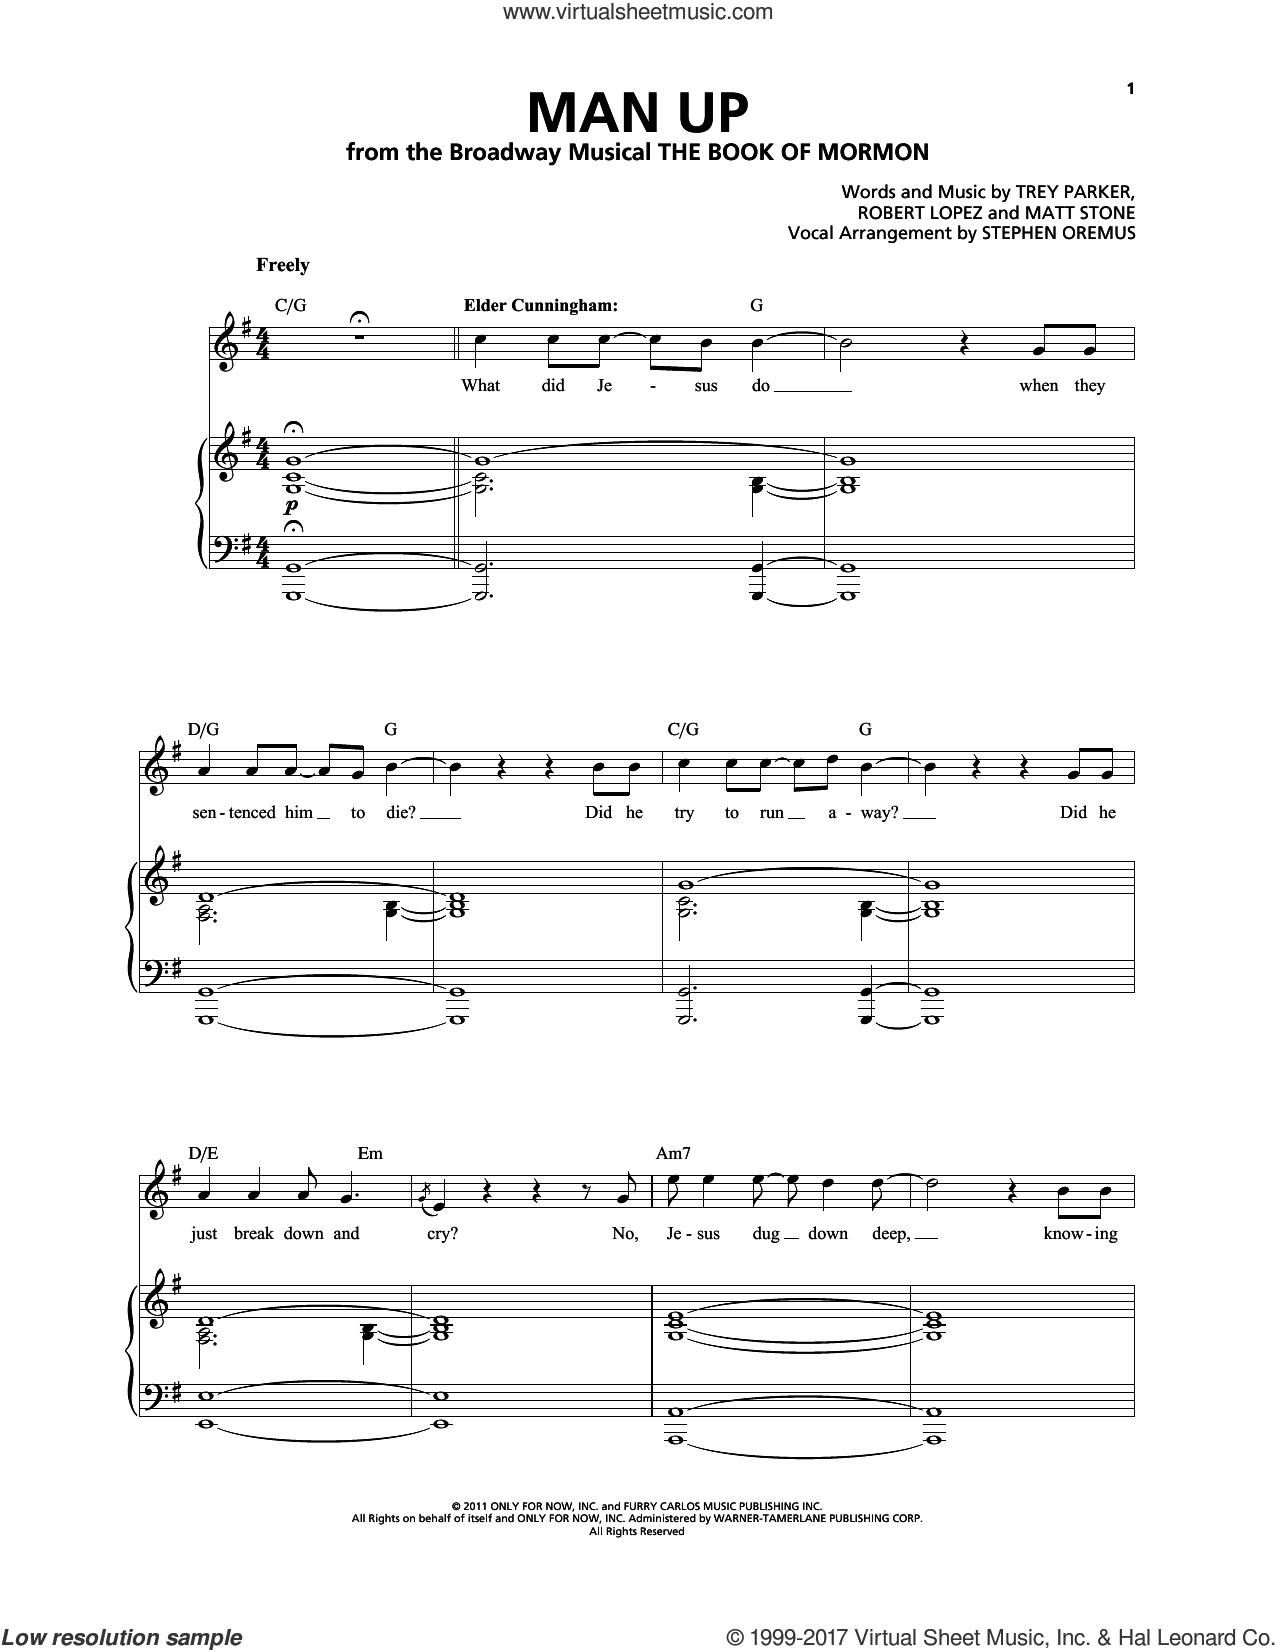 Man Up sheet music for voice and piano by Robert Lopez, Matthew Stone, Stephen Oremus, Trey Parker and Trey Parker & Matt Stone, intermediate skill level